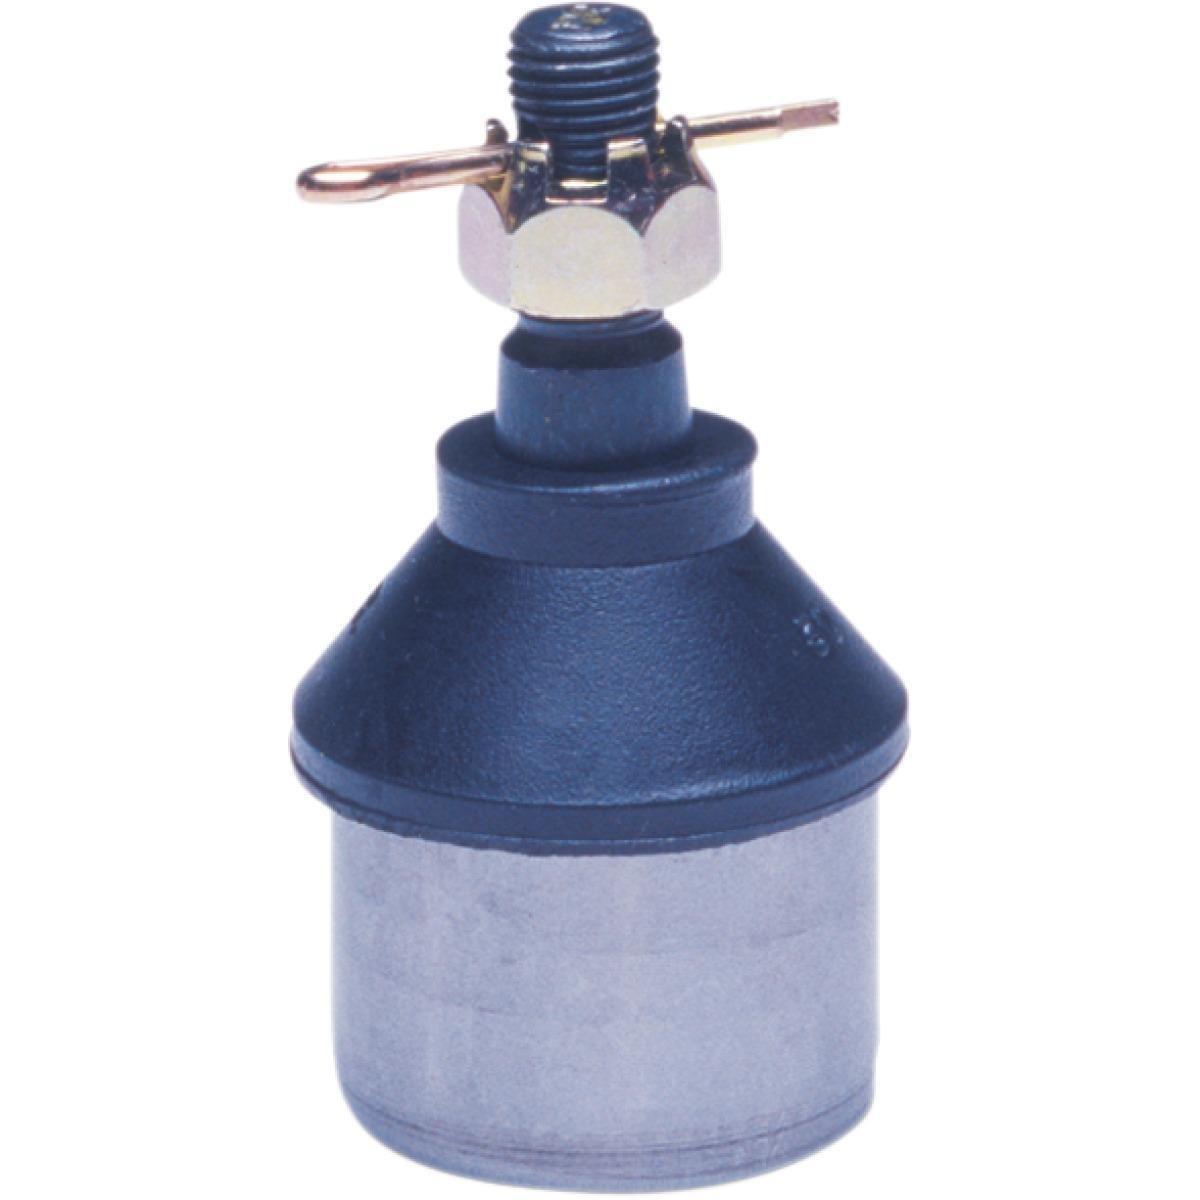 EPI Ball Joint Kit WE350047 by EPI